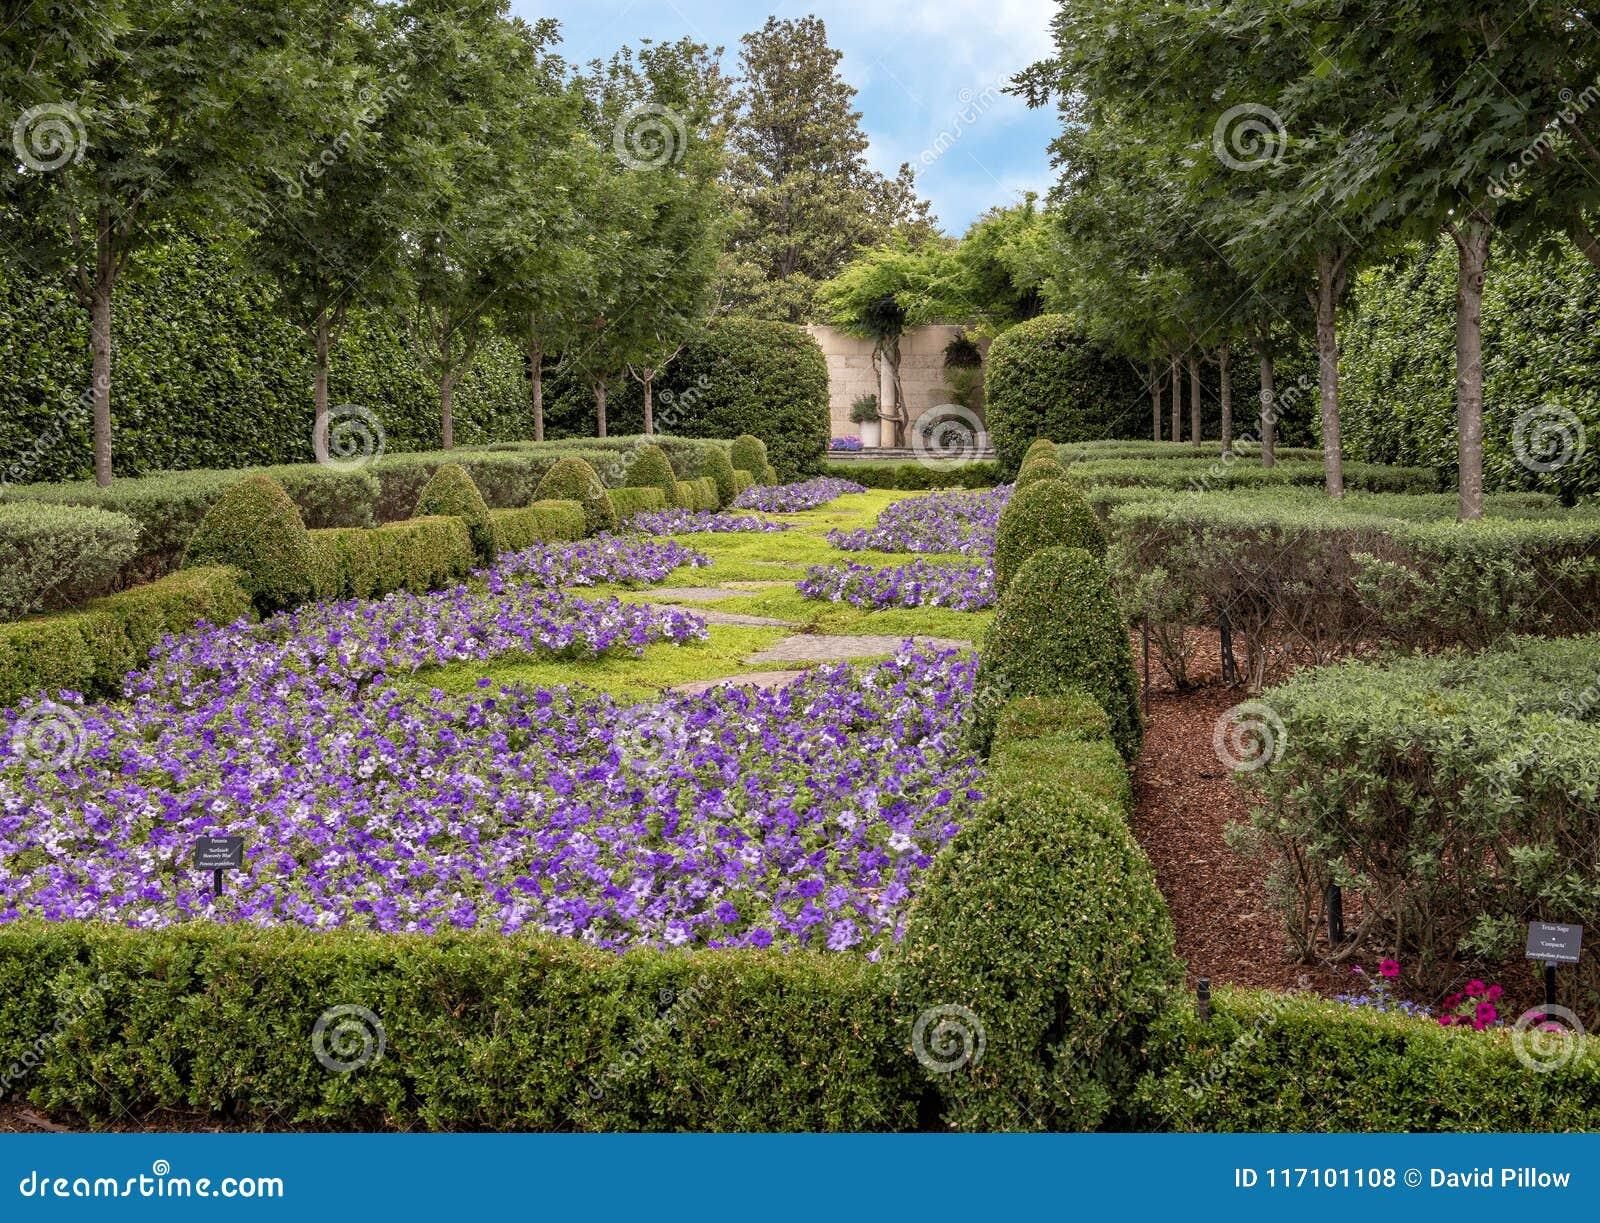 Bed Of Purple Petunias And Hedges Dallas Arboretum And Botanical